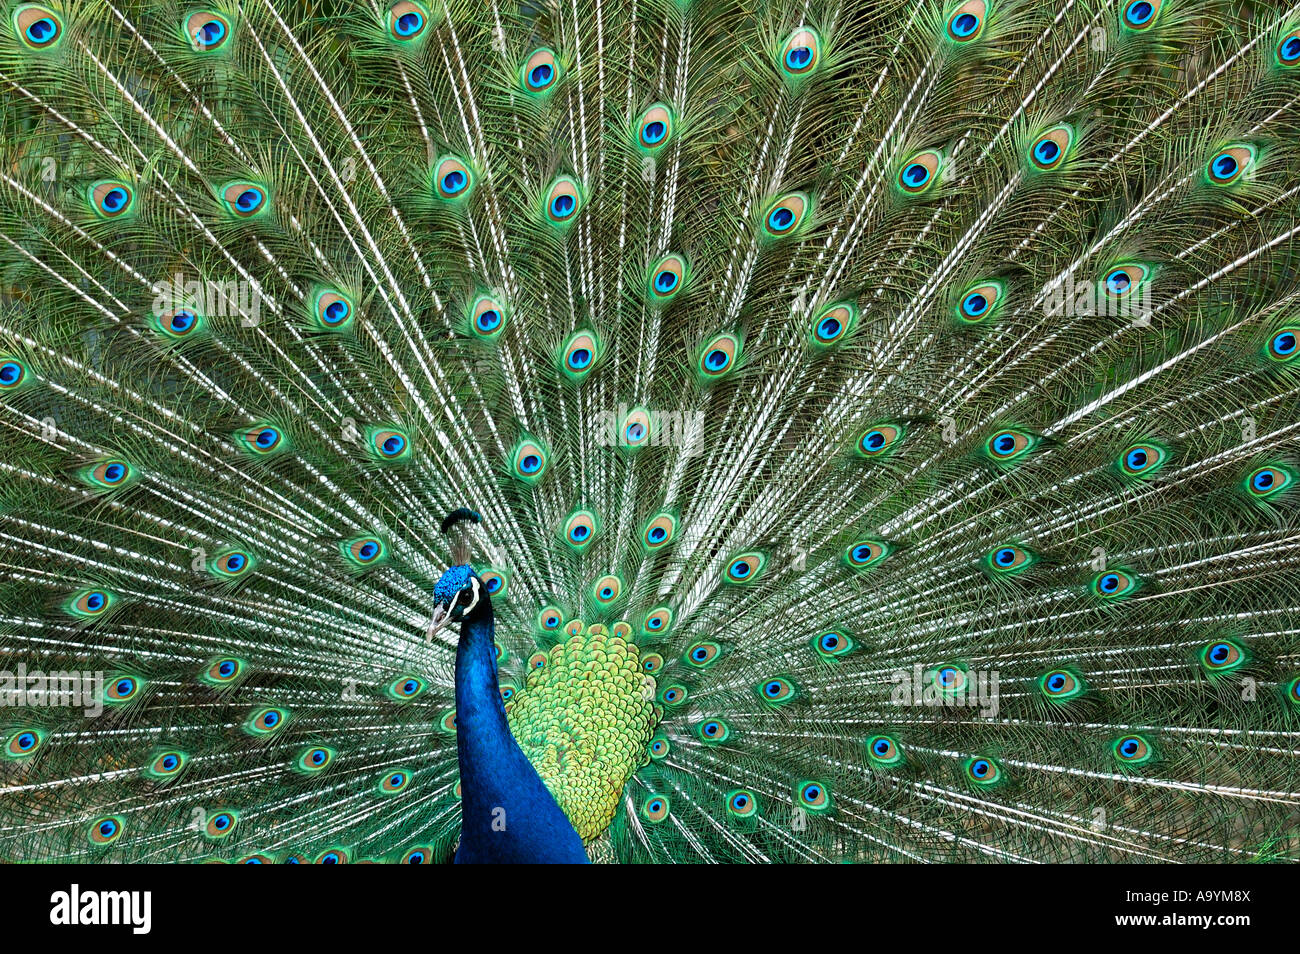 Peacock, Male Indian Peafowl, Blue Peafowl, Pavo cristatus Stock Photo